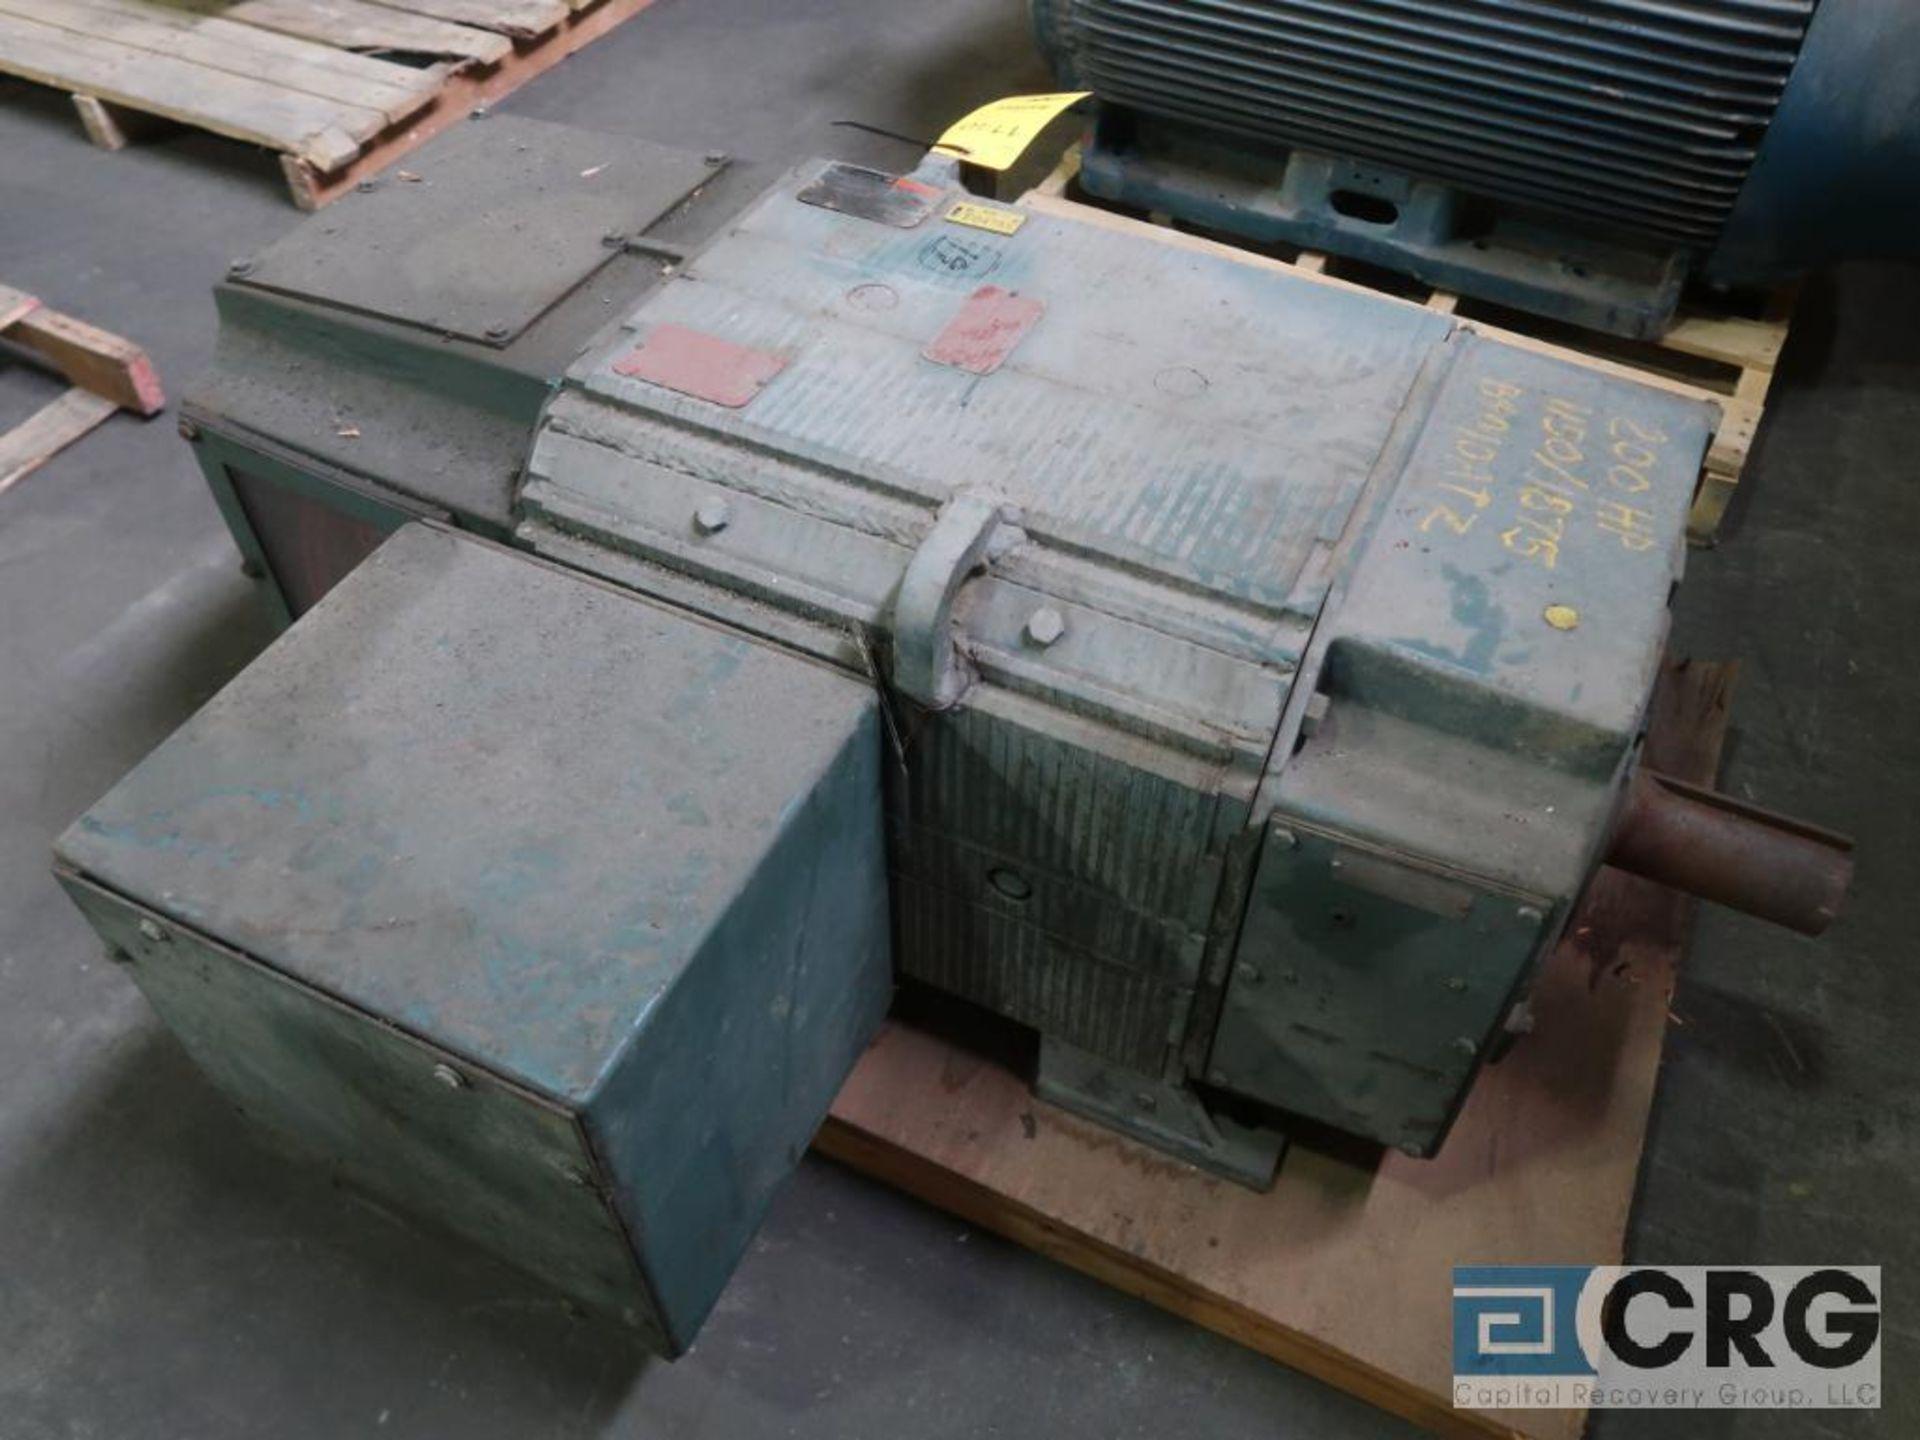 Reliance electric motor, 200 HP, 1,150/1,875 RPMs, 500 volt, B4010ATZ frame (Finish Building)